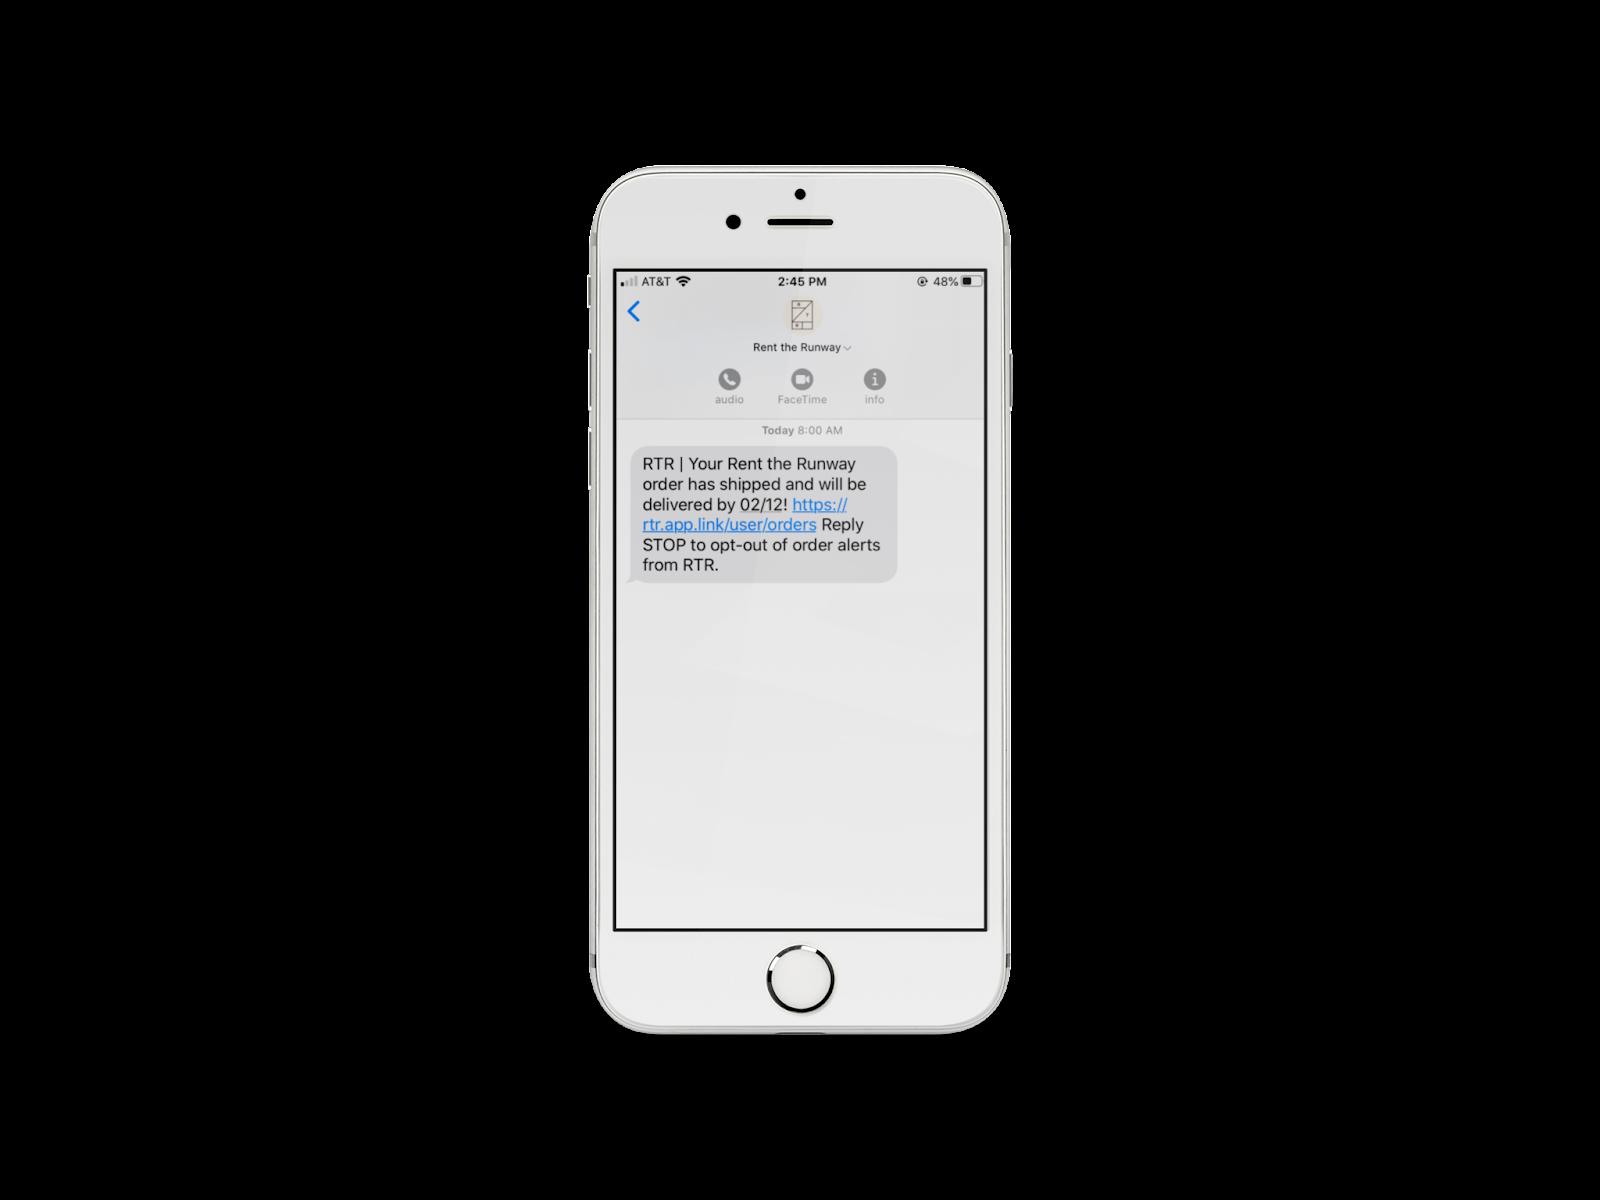 ejemplo mensaje de texto